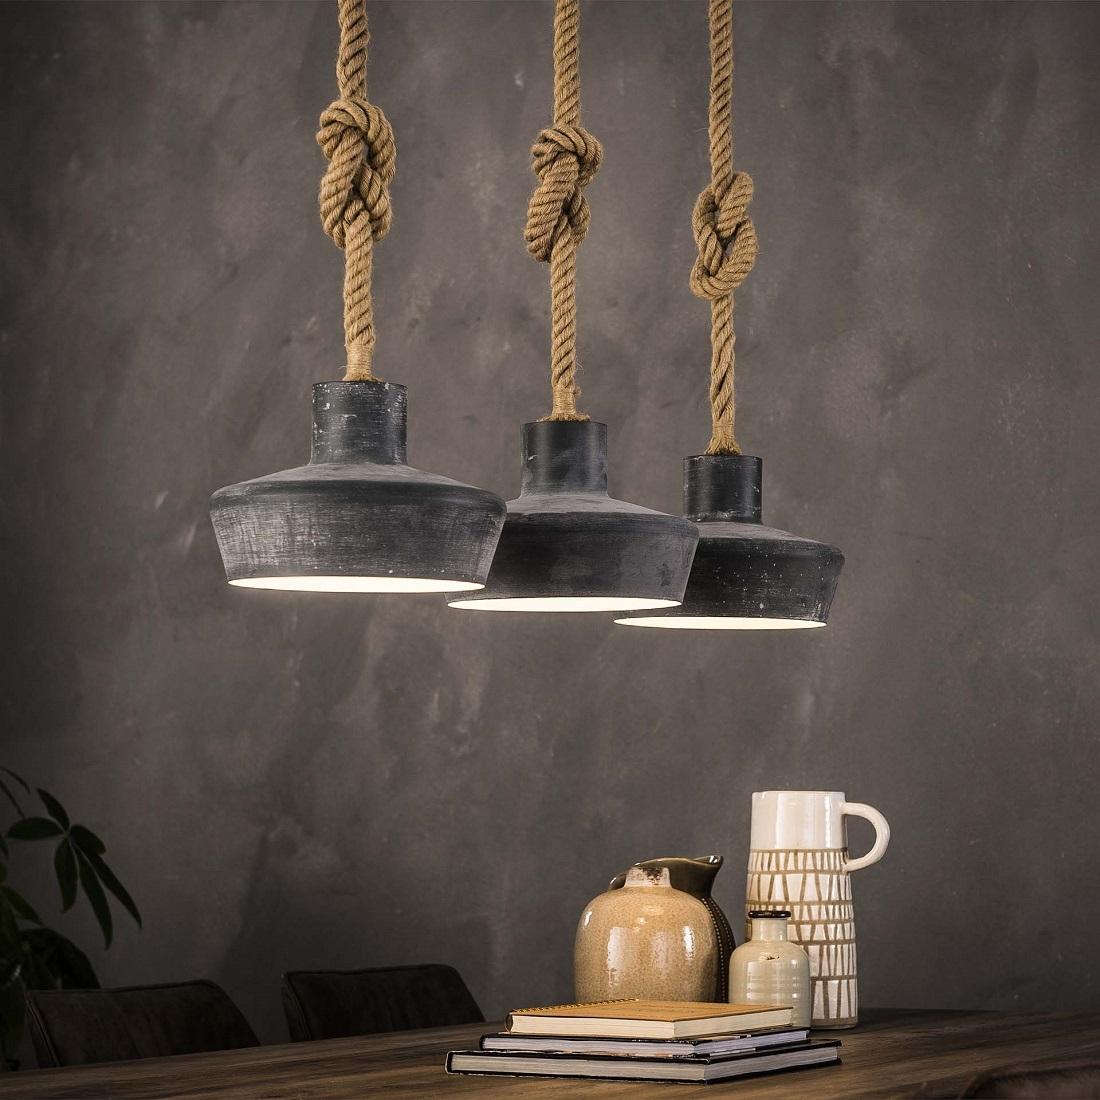 Hanglamp Mykelti 3LxØ28 van 110 cm breed – Grijs | Zaloni